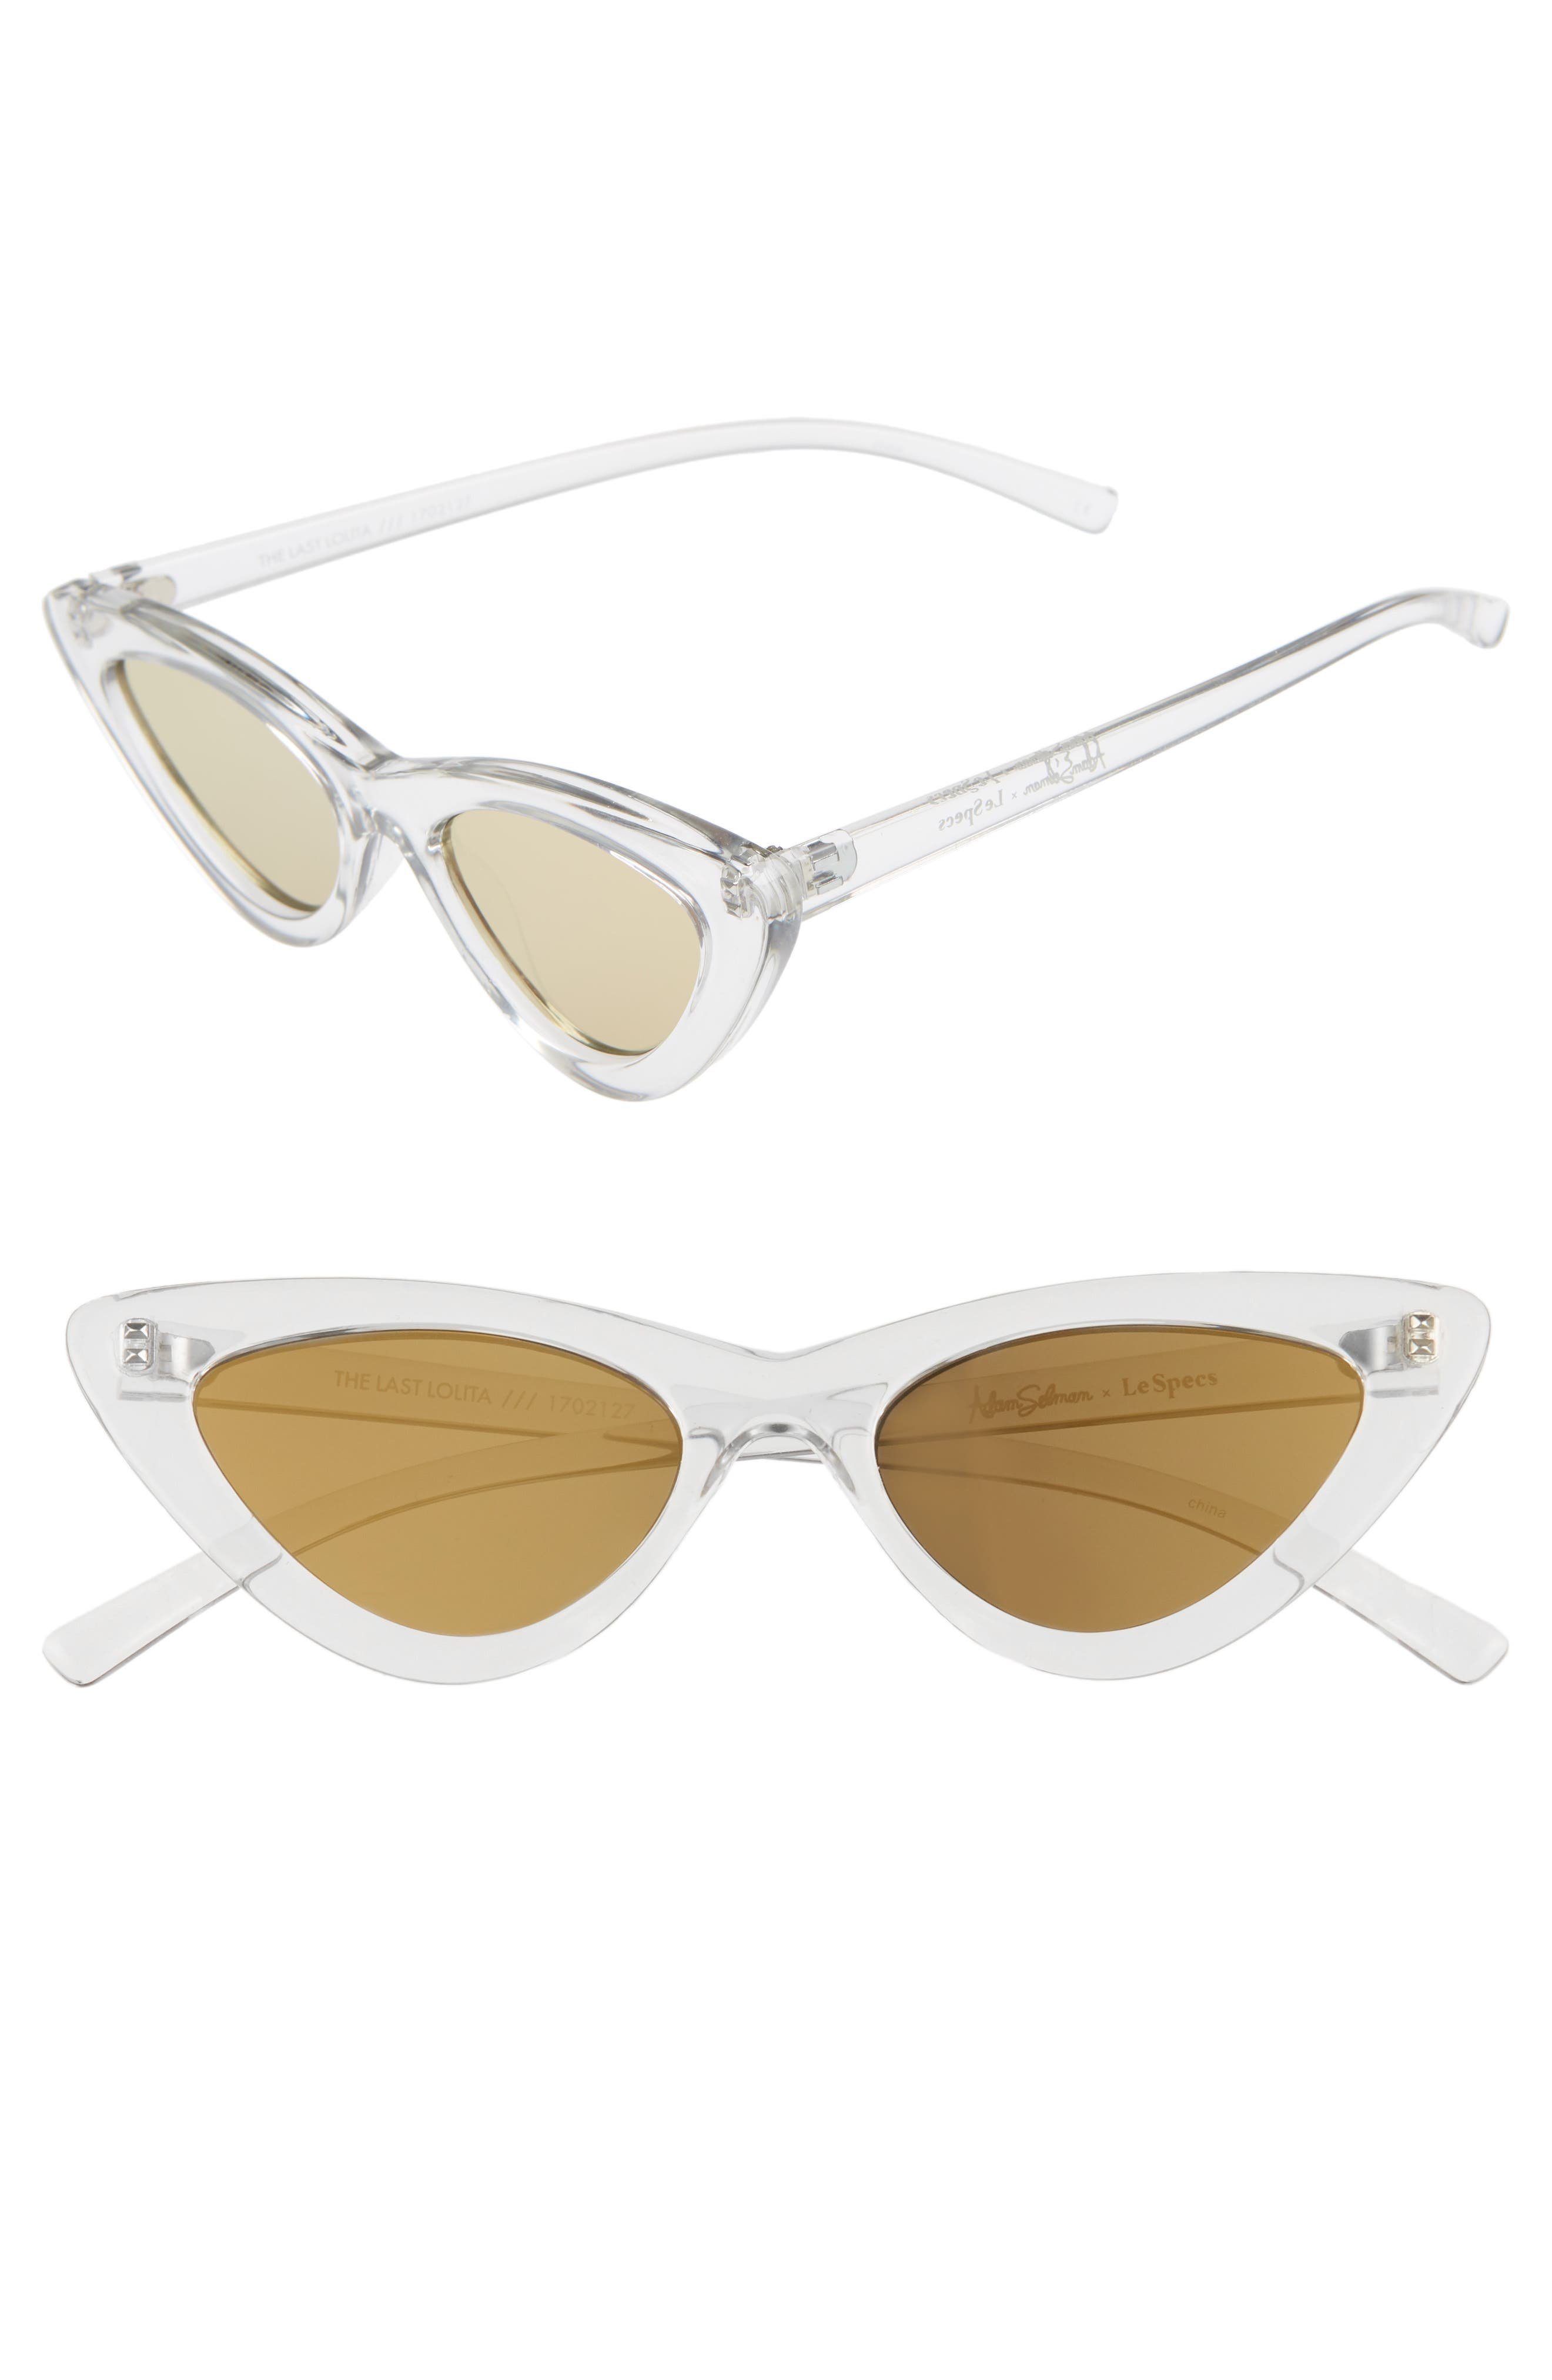 Adam Selman X Le Specs Luxe Lolita 4m Cat Eye Sunglasses - Crystal Grey